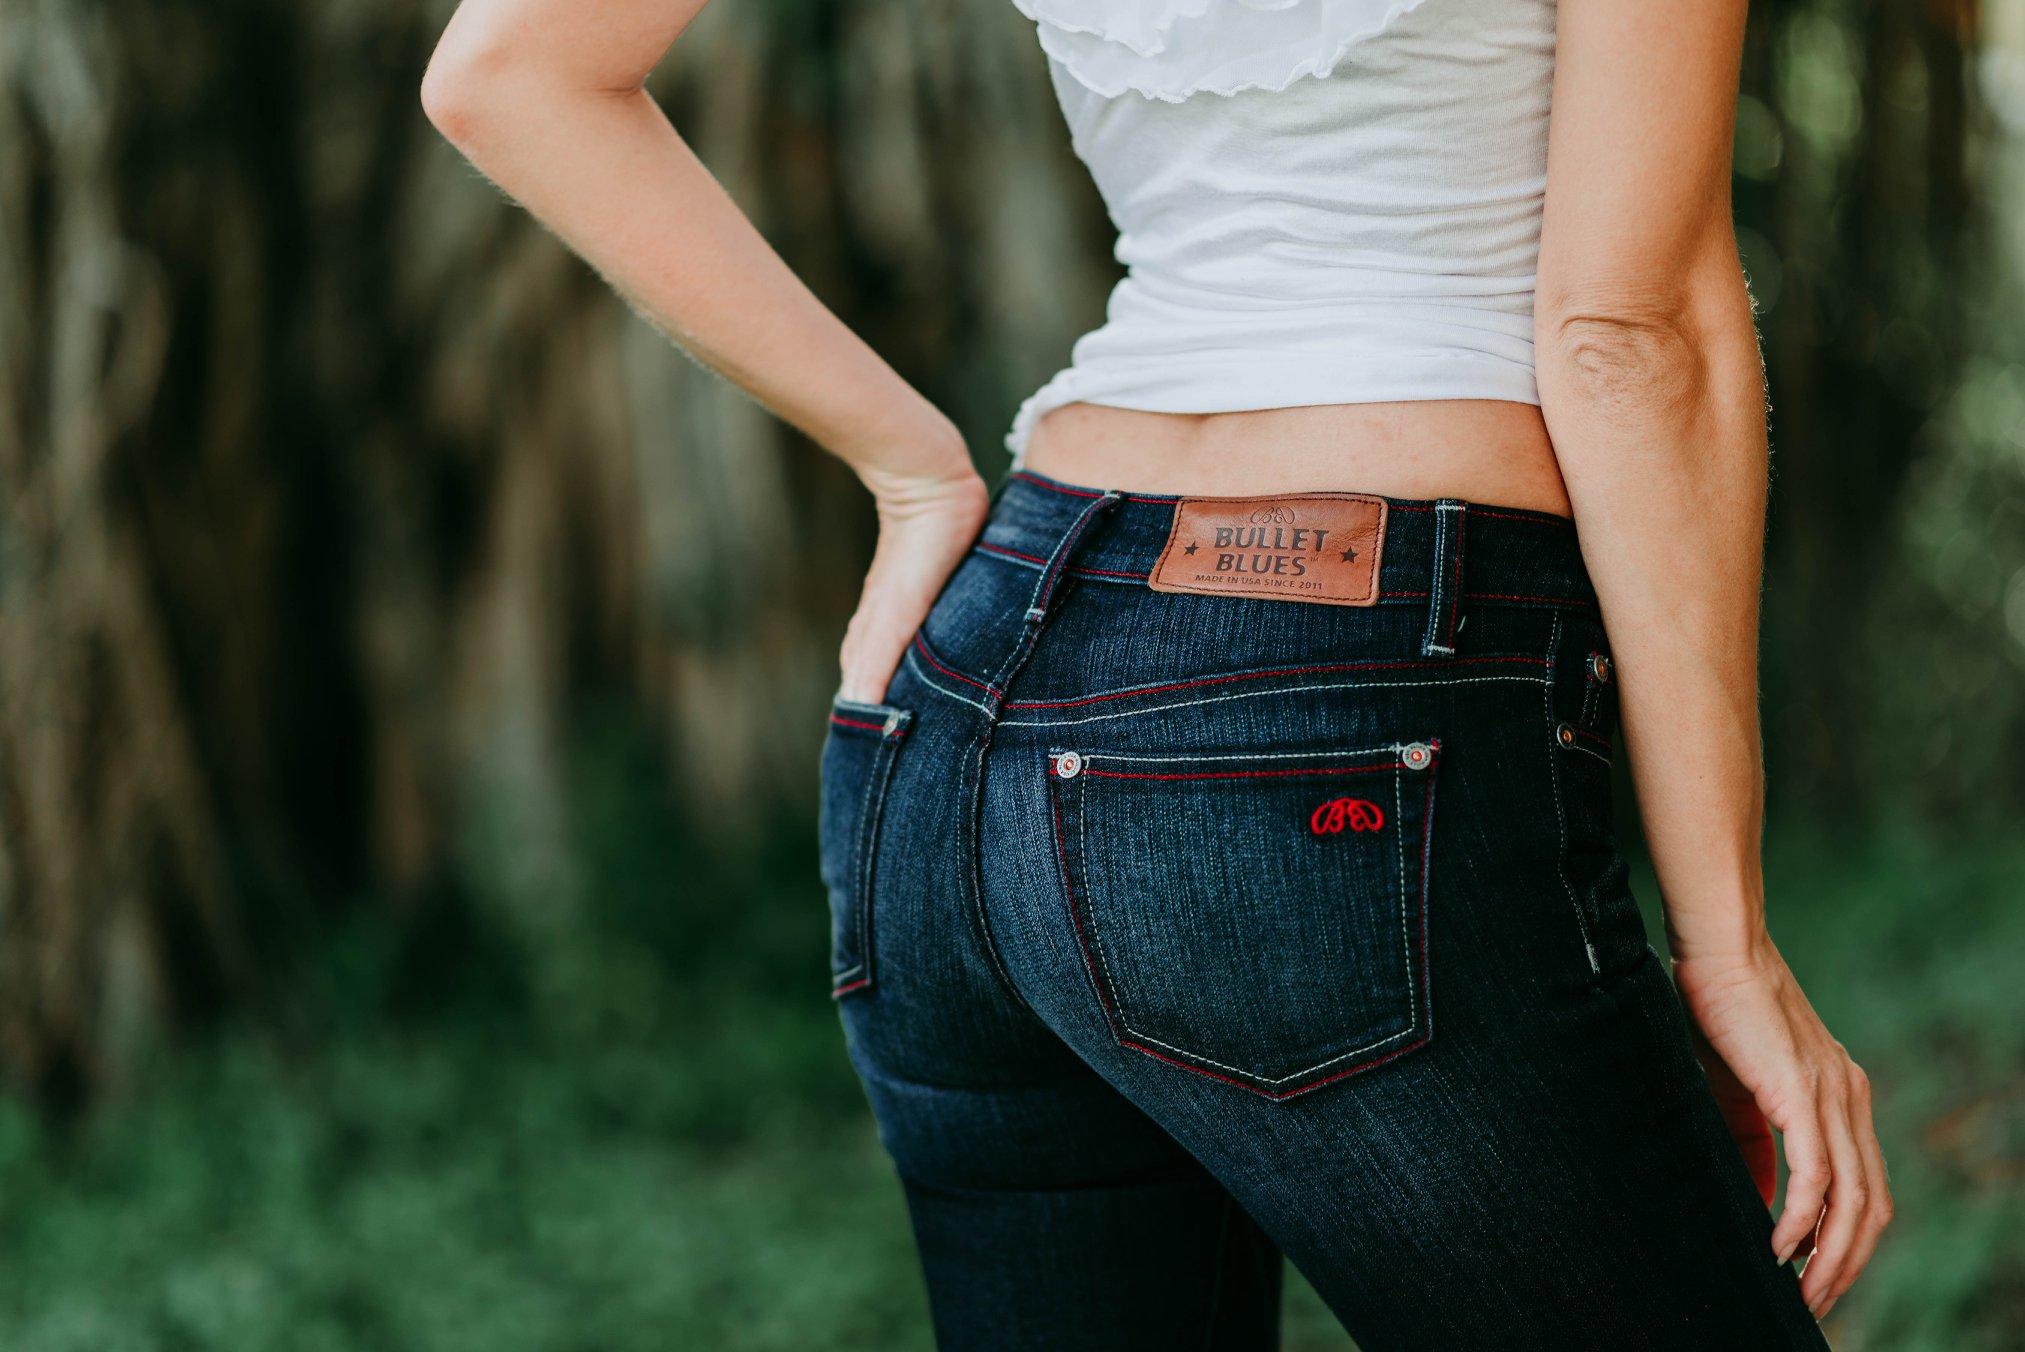 Bullet Blues 'Bombshell Bleu de Minuit' Dark Wash Boot-Cut Jeans - Made in America - Shop American-Made Women's Jeans